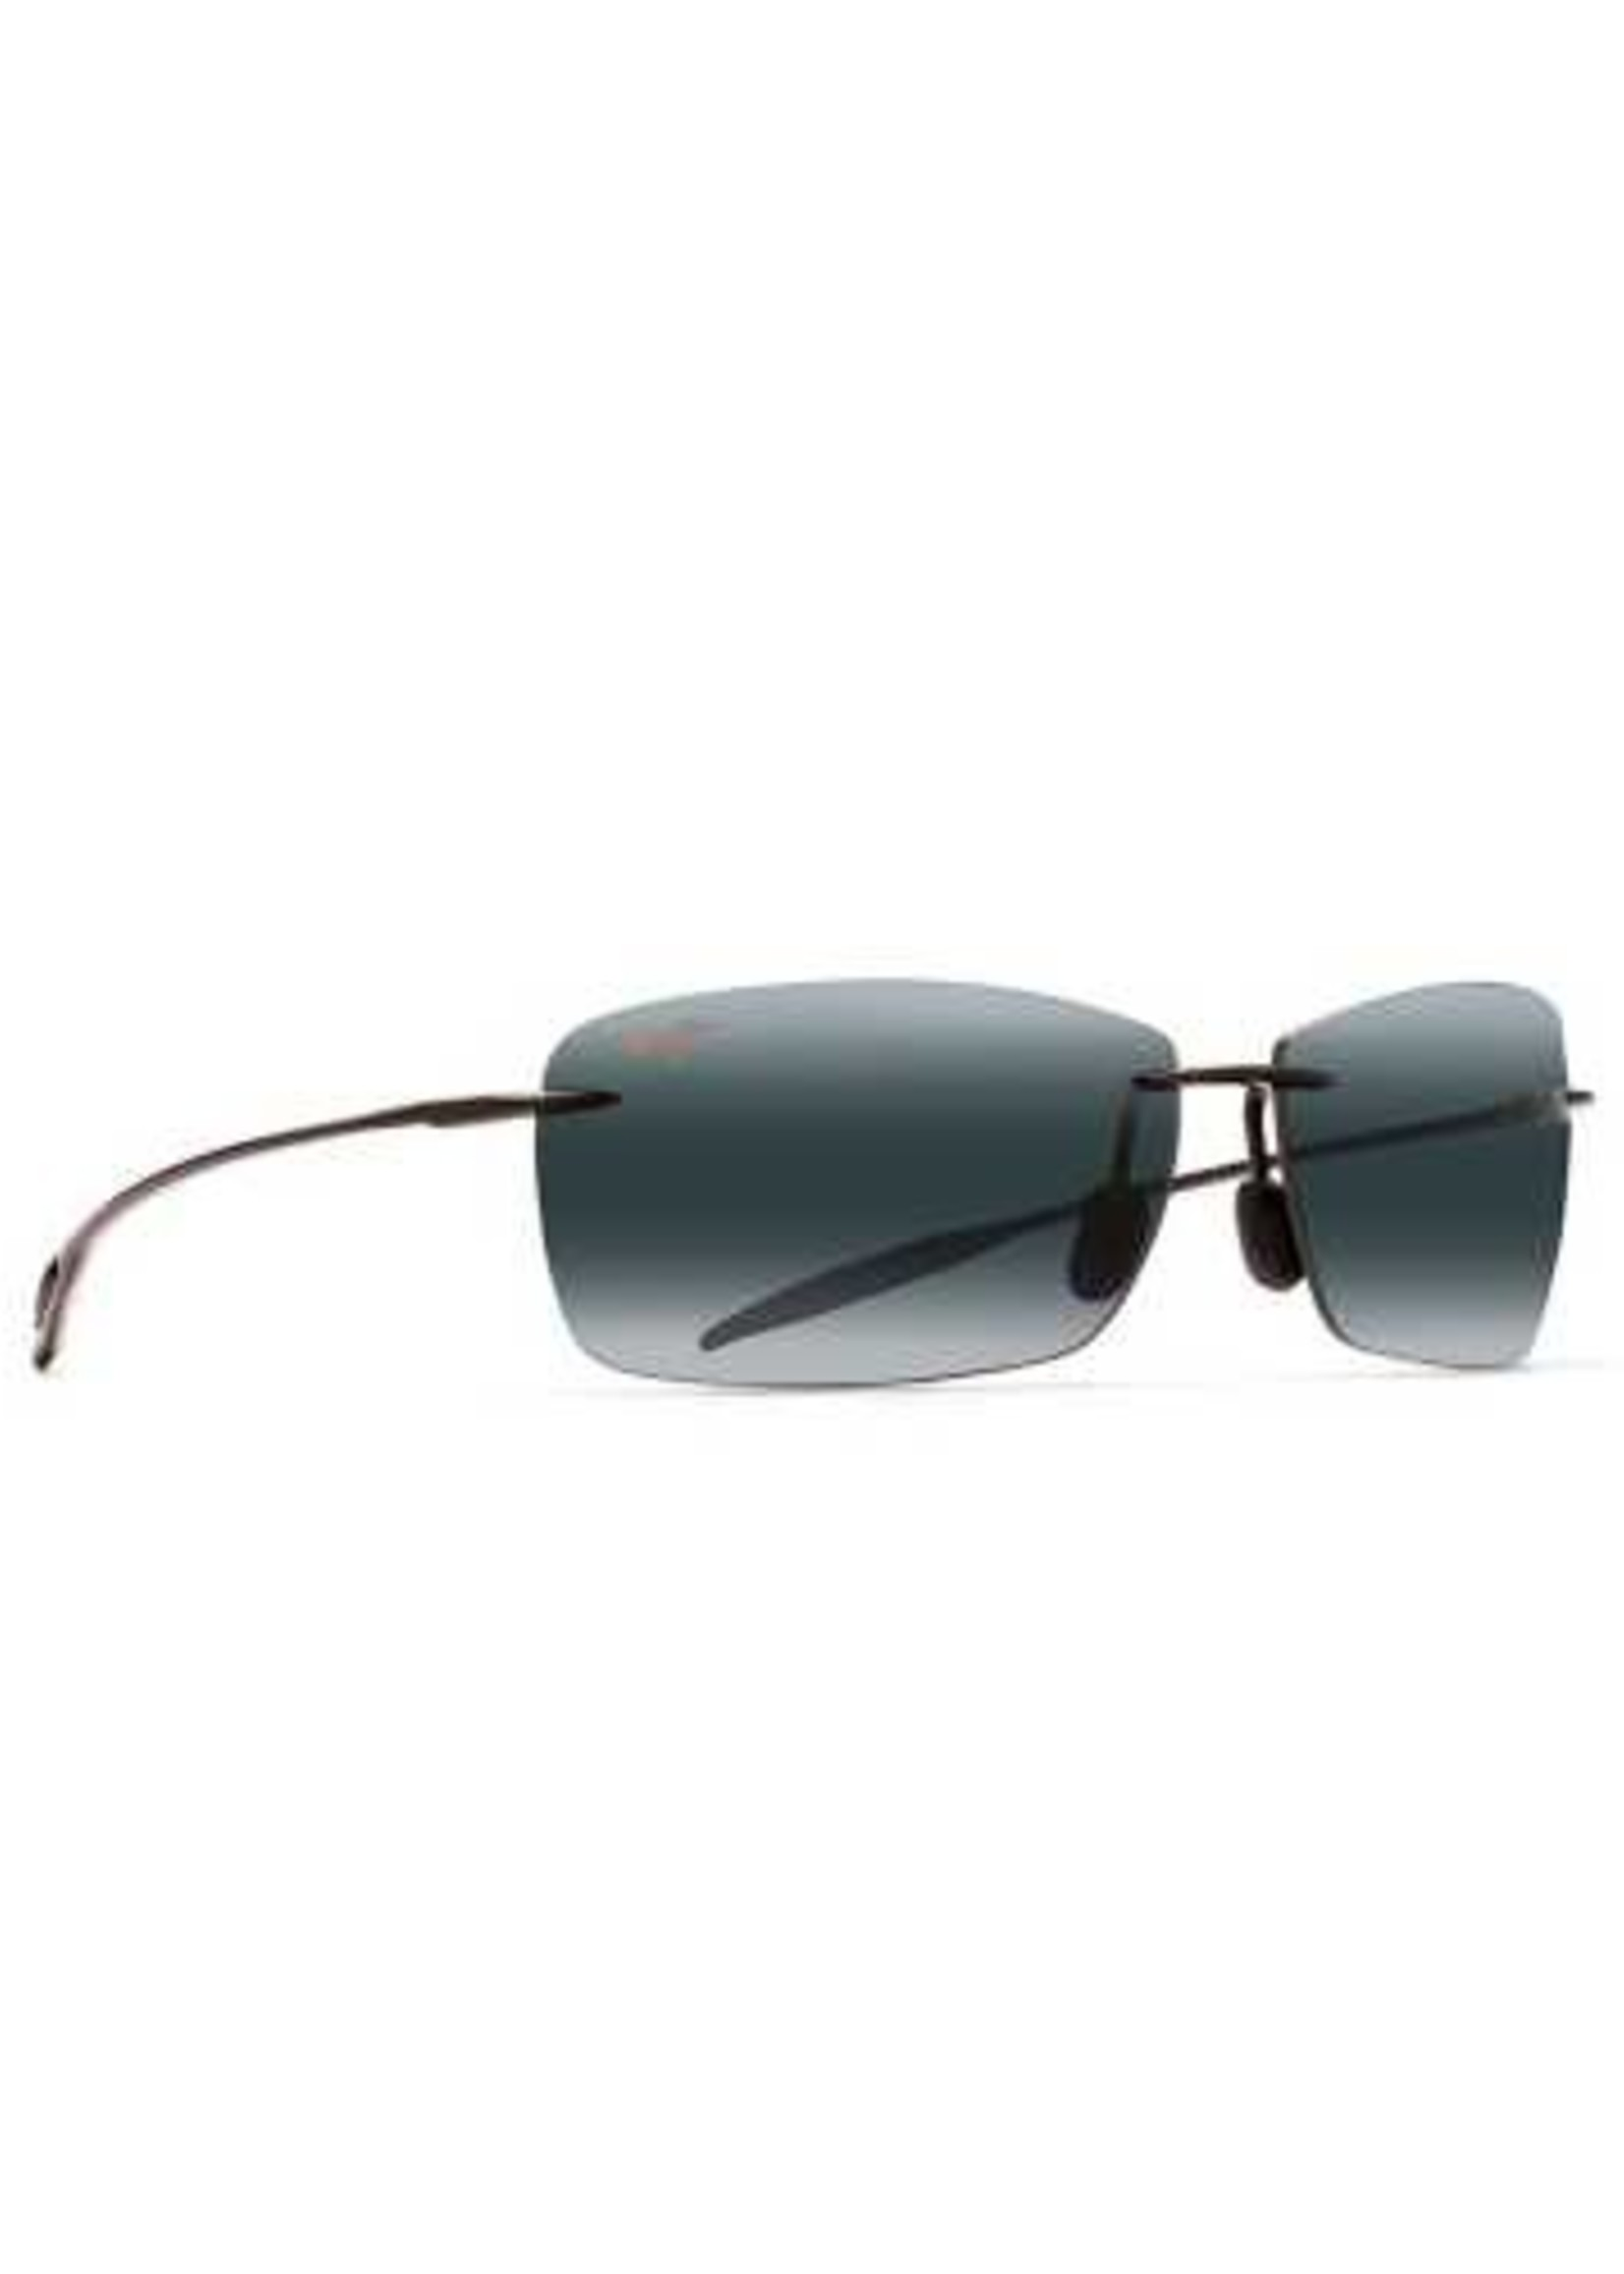 Maui Jim Breakwall Gloss Black/Neutral Grey